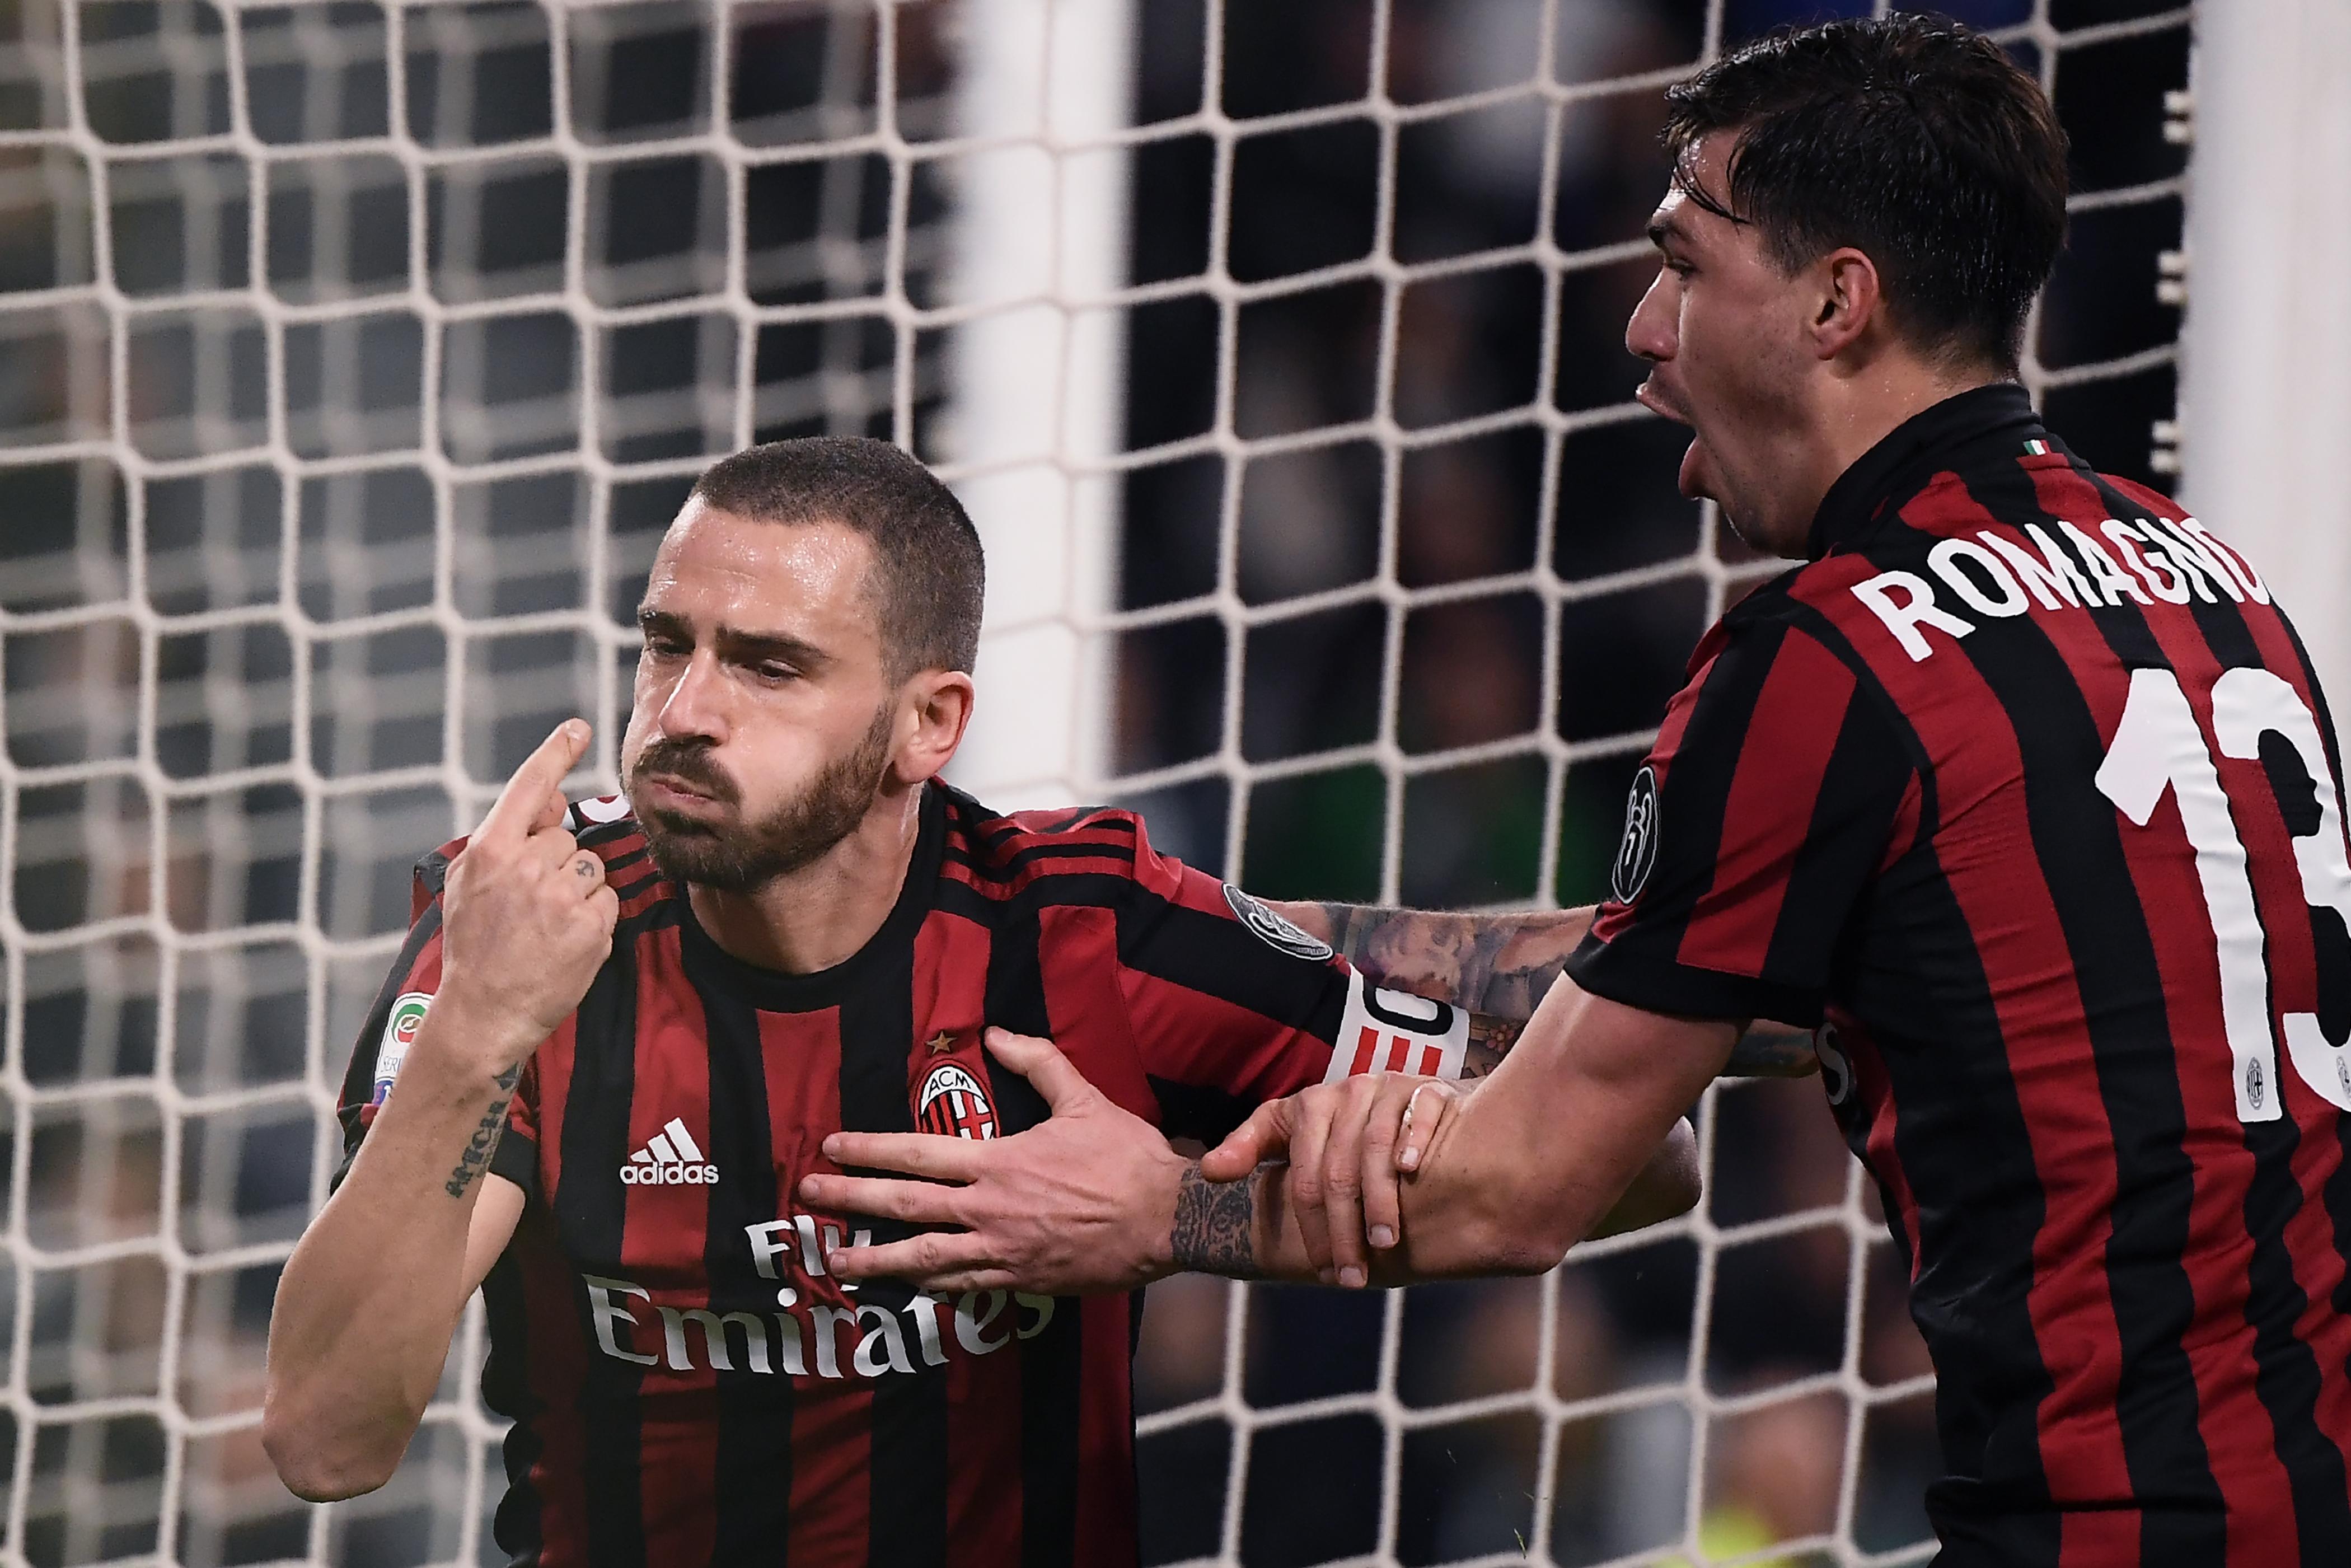 Leonardo Bonucci esulta dopo il proprio gol in Juventus-Milan